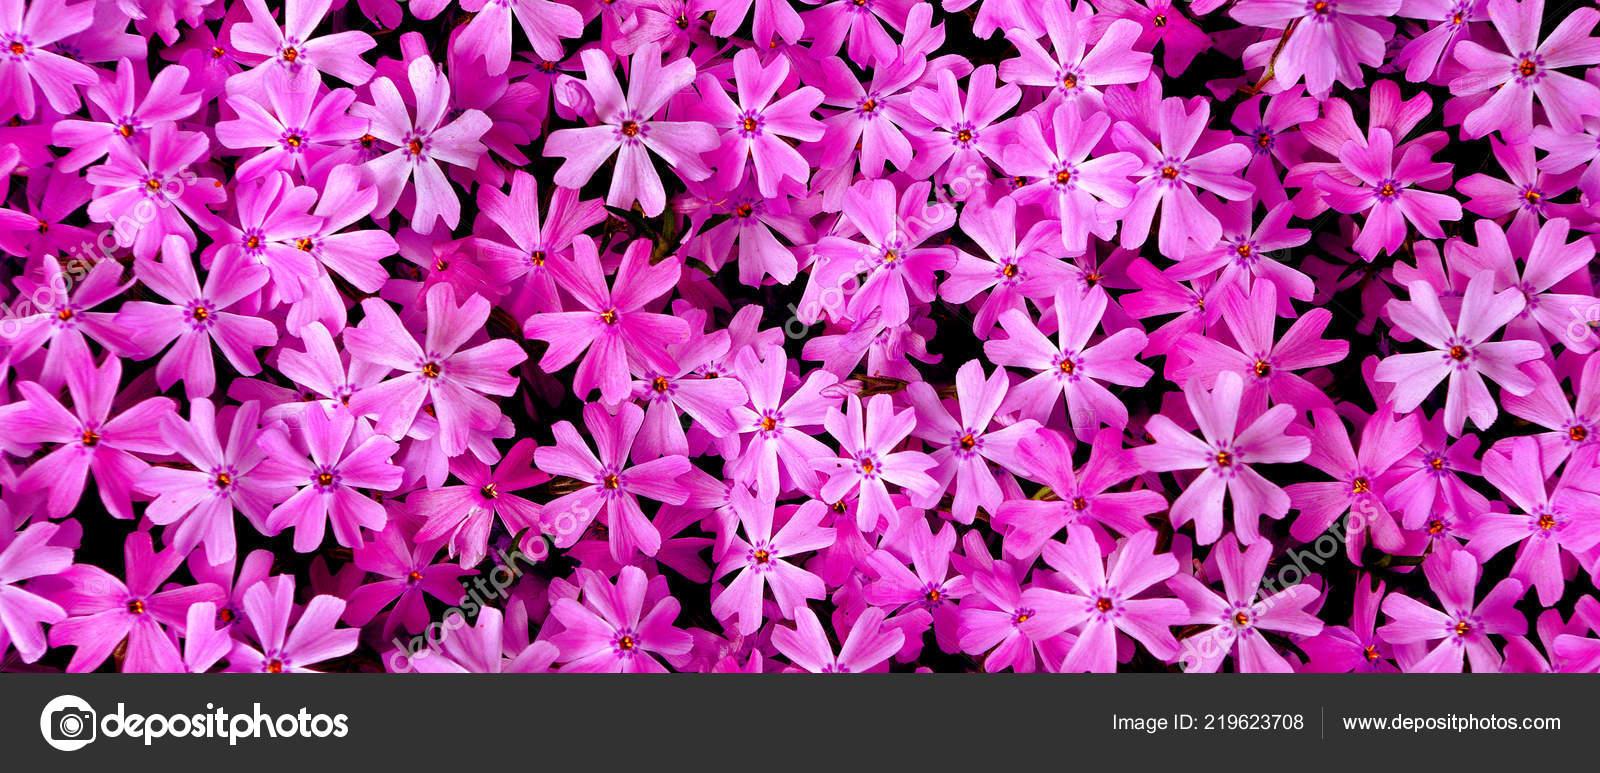 Pink Flowers Garden Top View Natural Pink Background \u2014 Stock